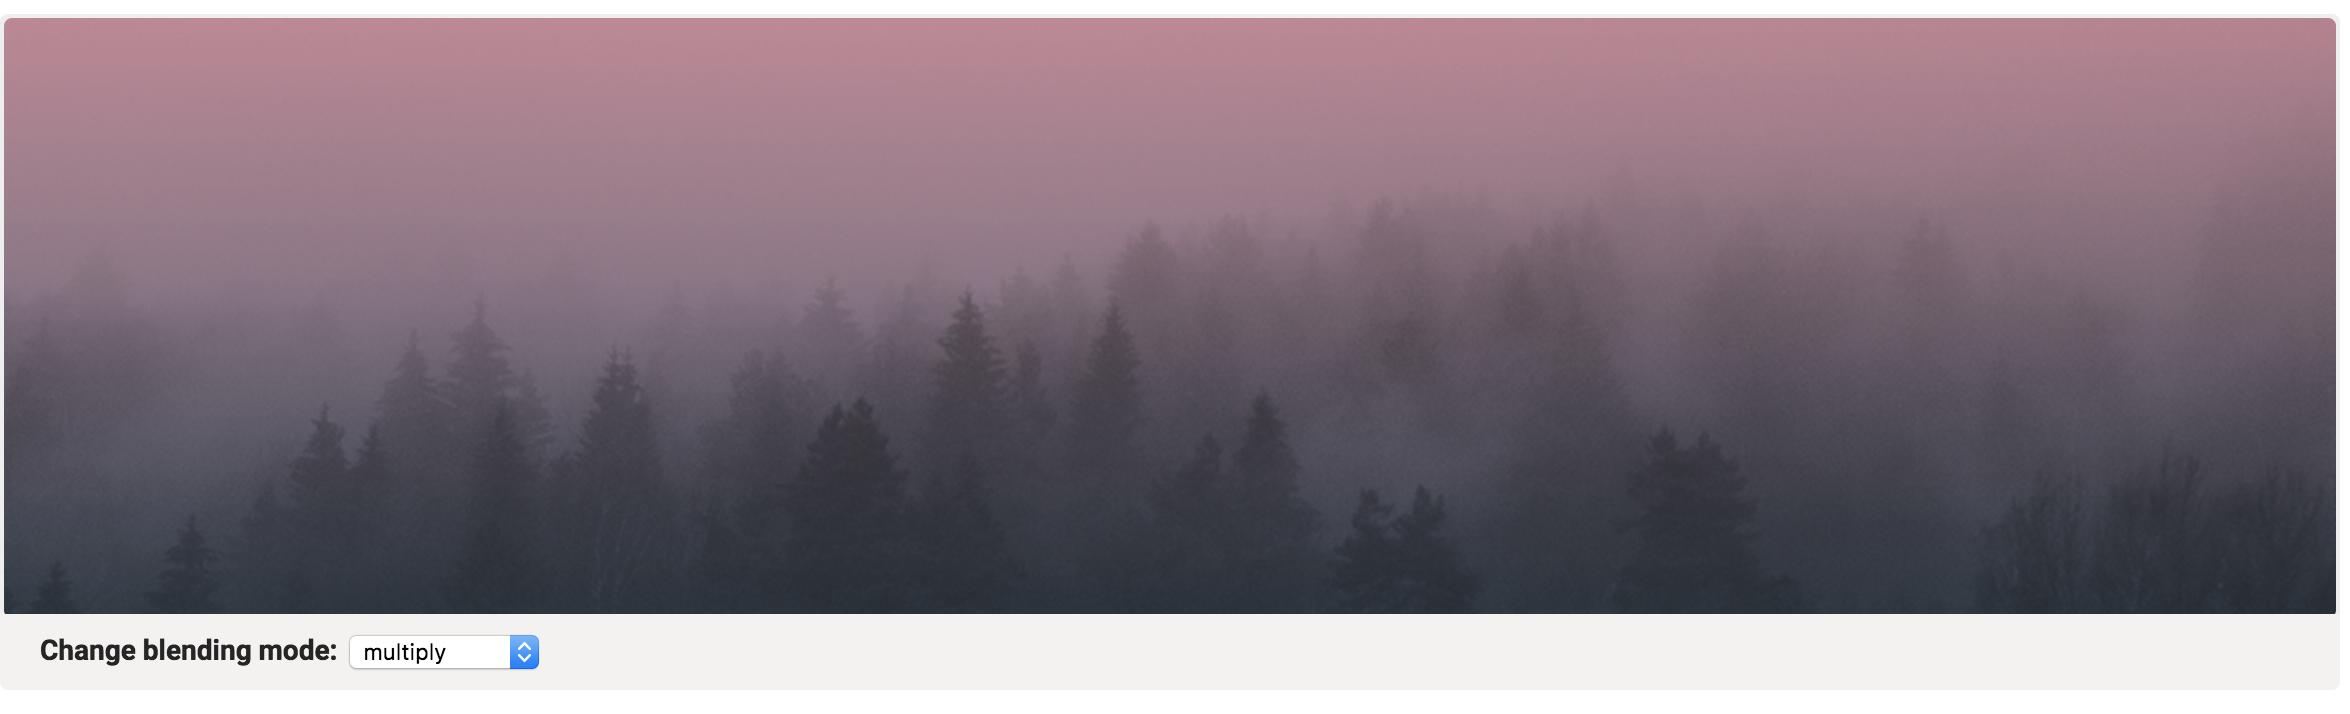 Screenshot_2019-02-28 20.55.56_RaImf3.png